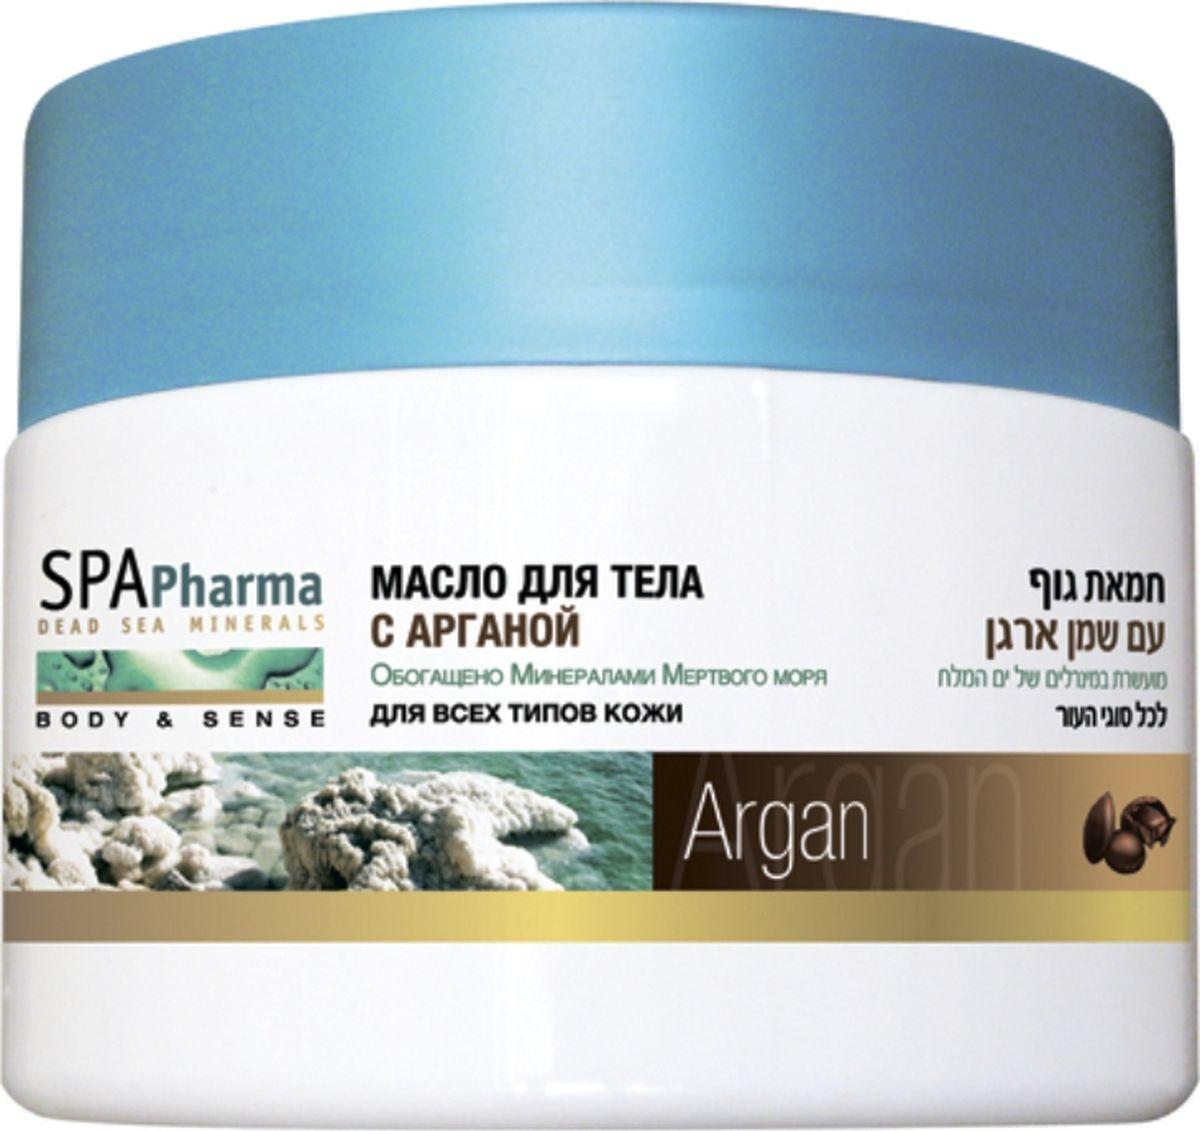 Spa Pharma Масло для тела с арганой для всех типов кожи (антивозрастное), Spa Pharma 350 мл недорого